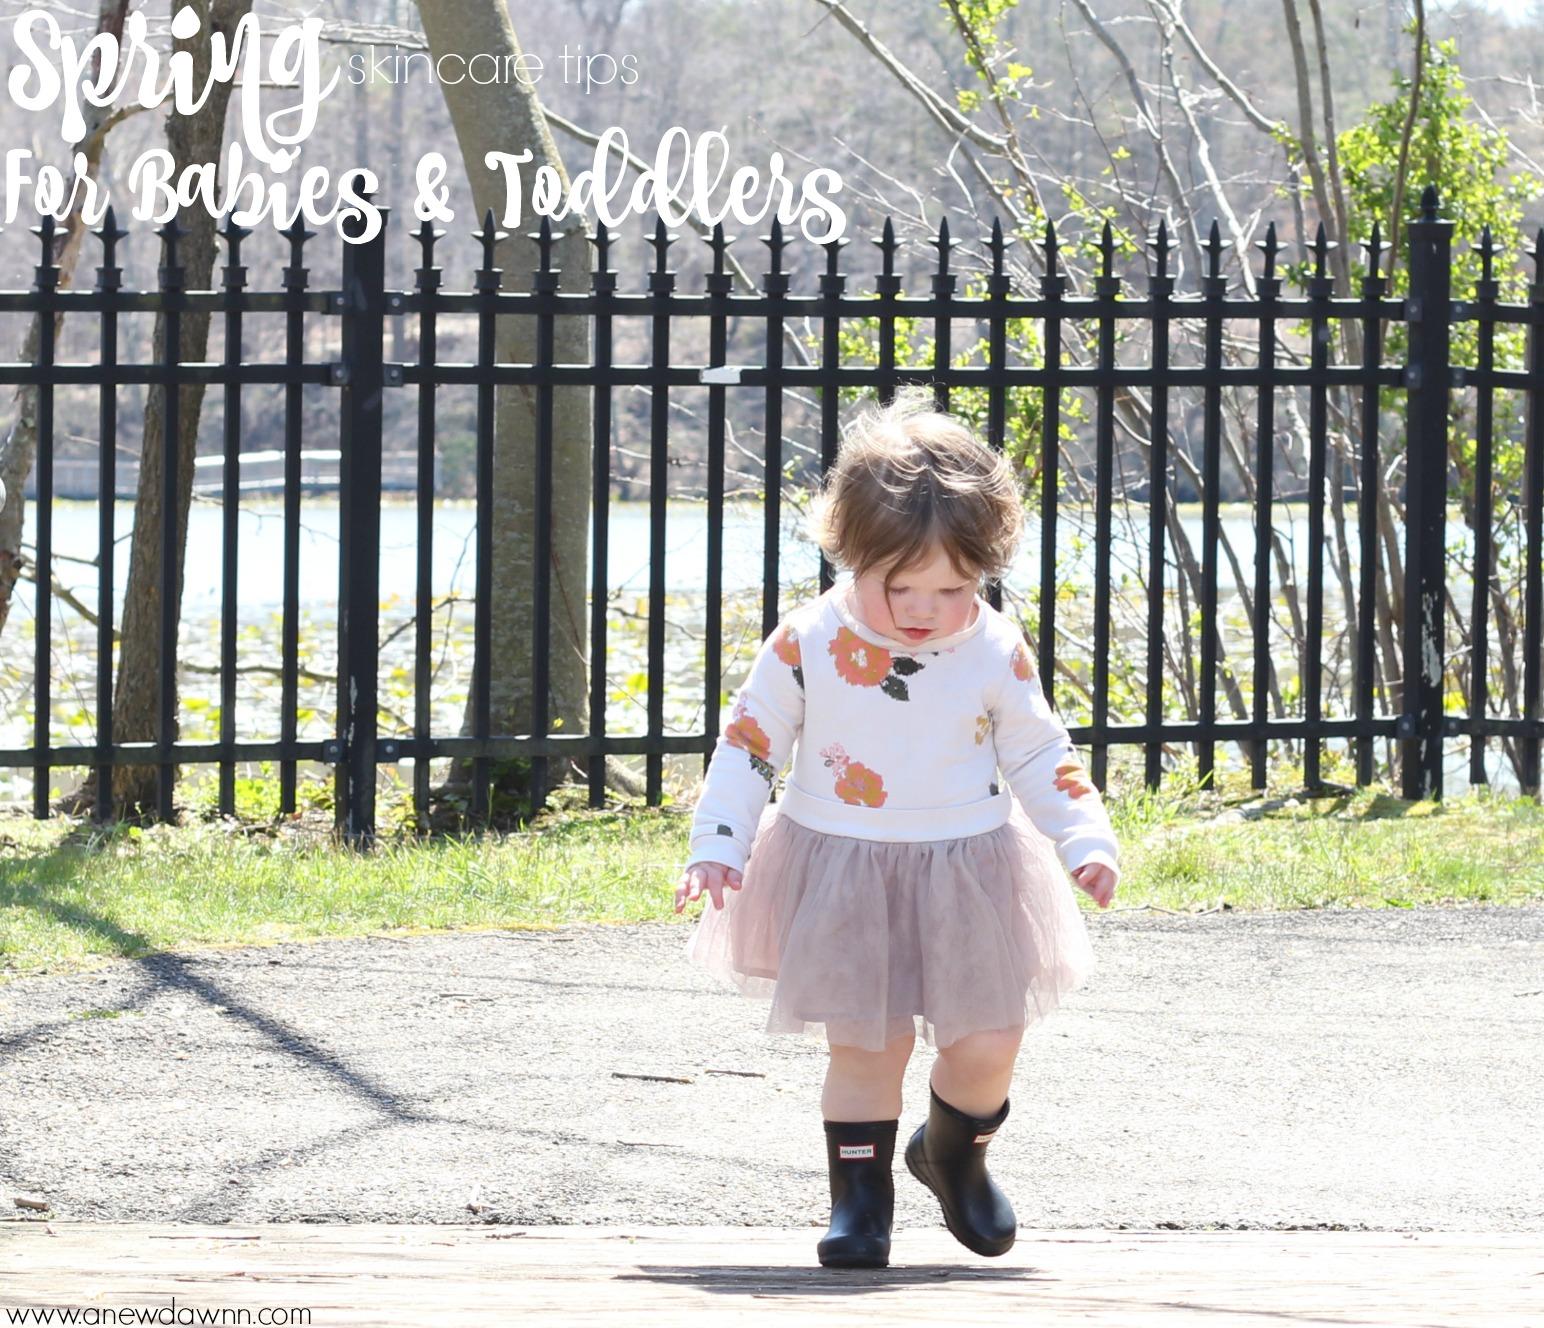 Spring-skin-care-tips-babies